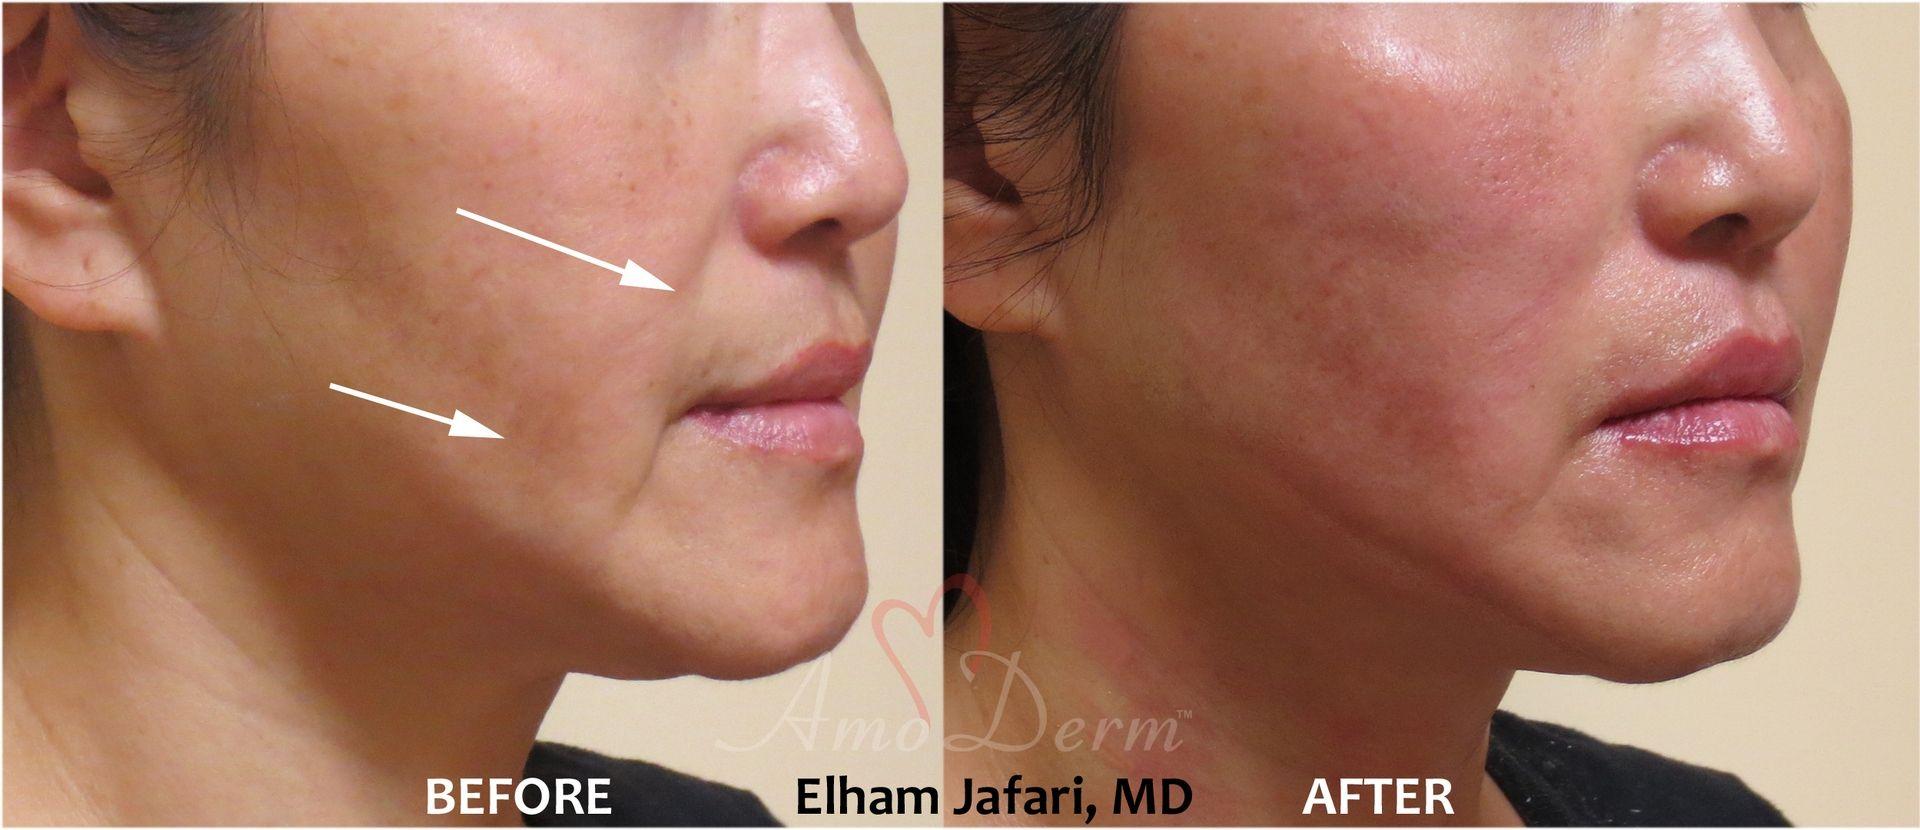 Thread Lift - Non-surgical Cosmetic Procedure in Irvine